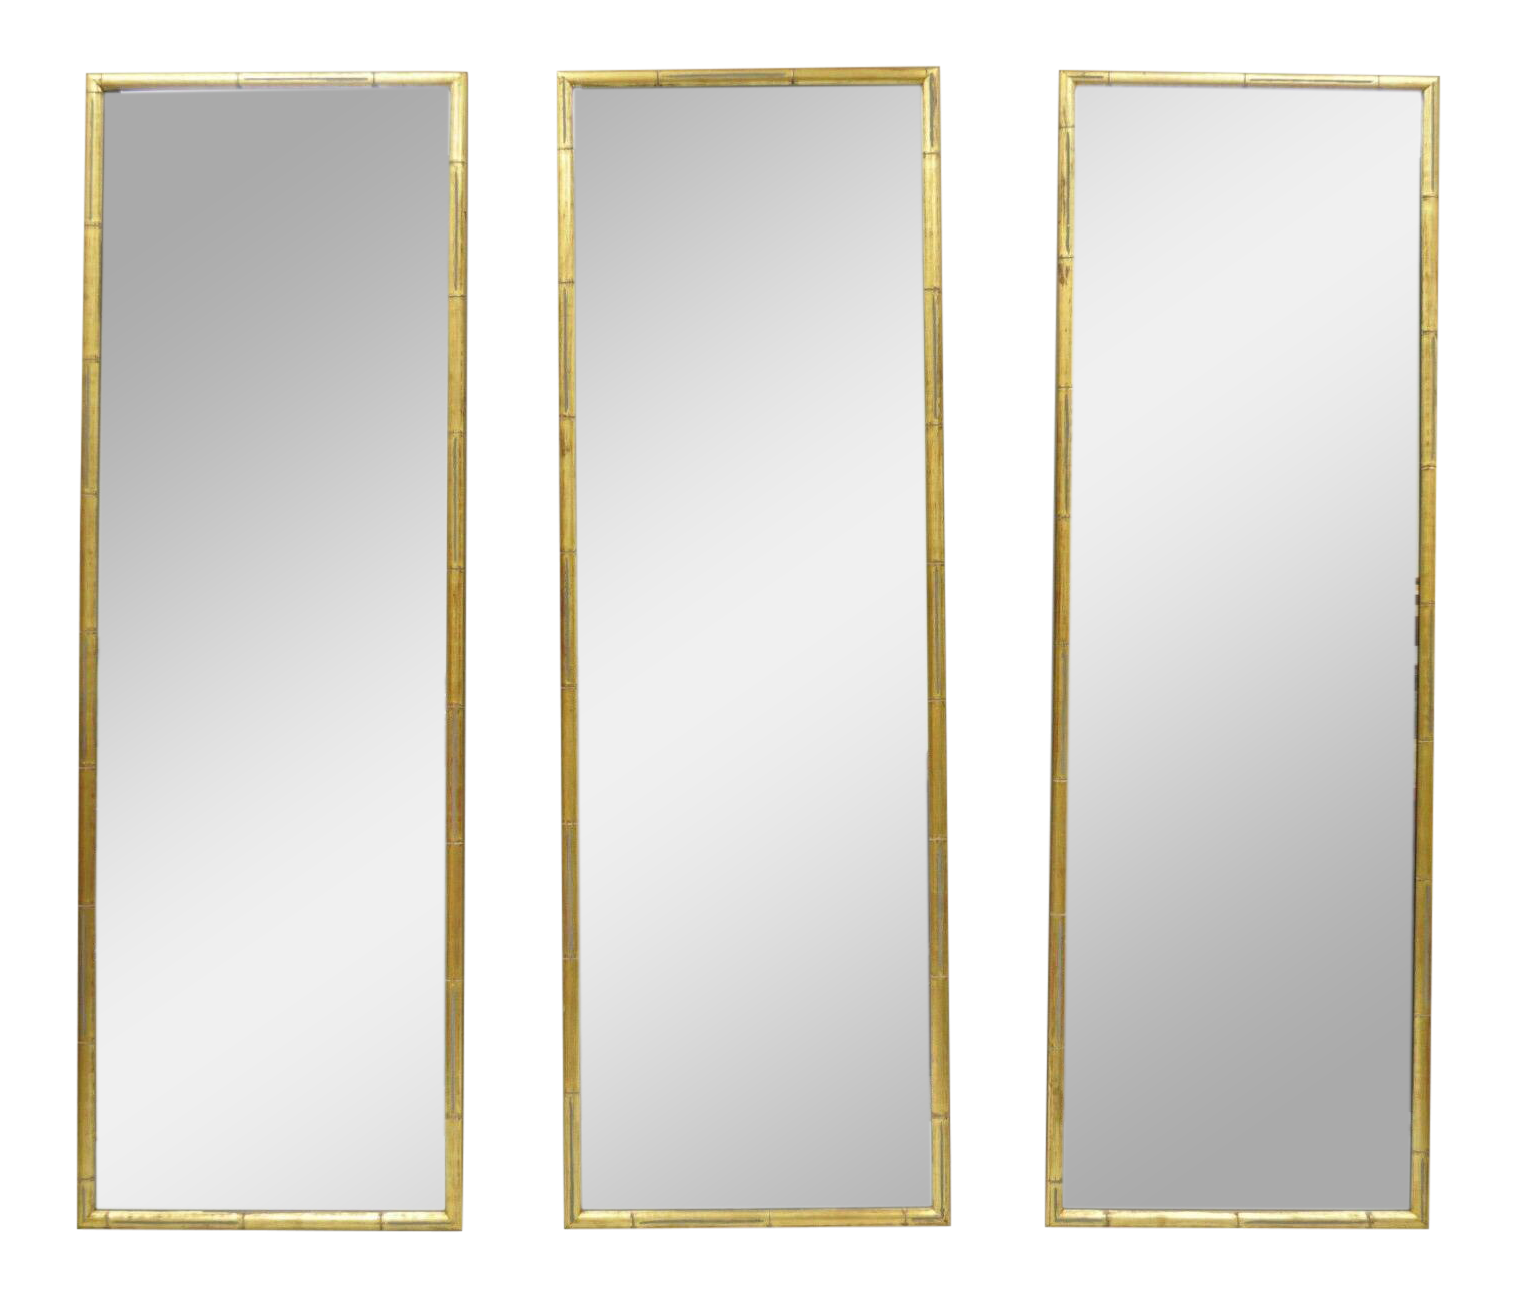 Vintage Italian Hollywood Regency Faux Bamboo Wall Mirrors Set Of 3 Chairish